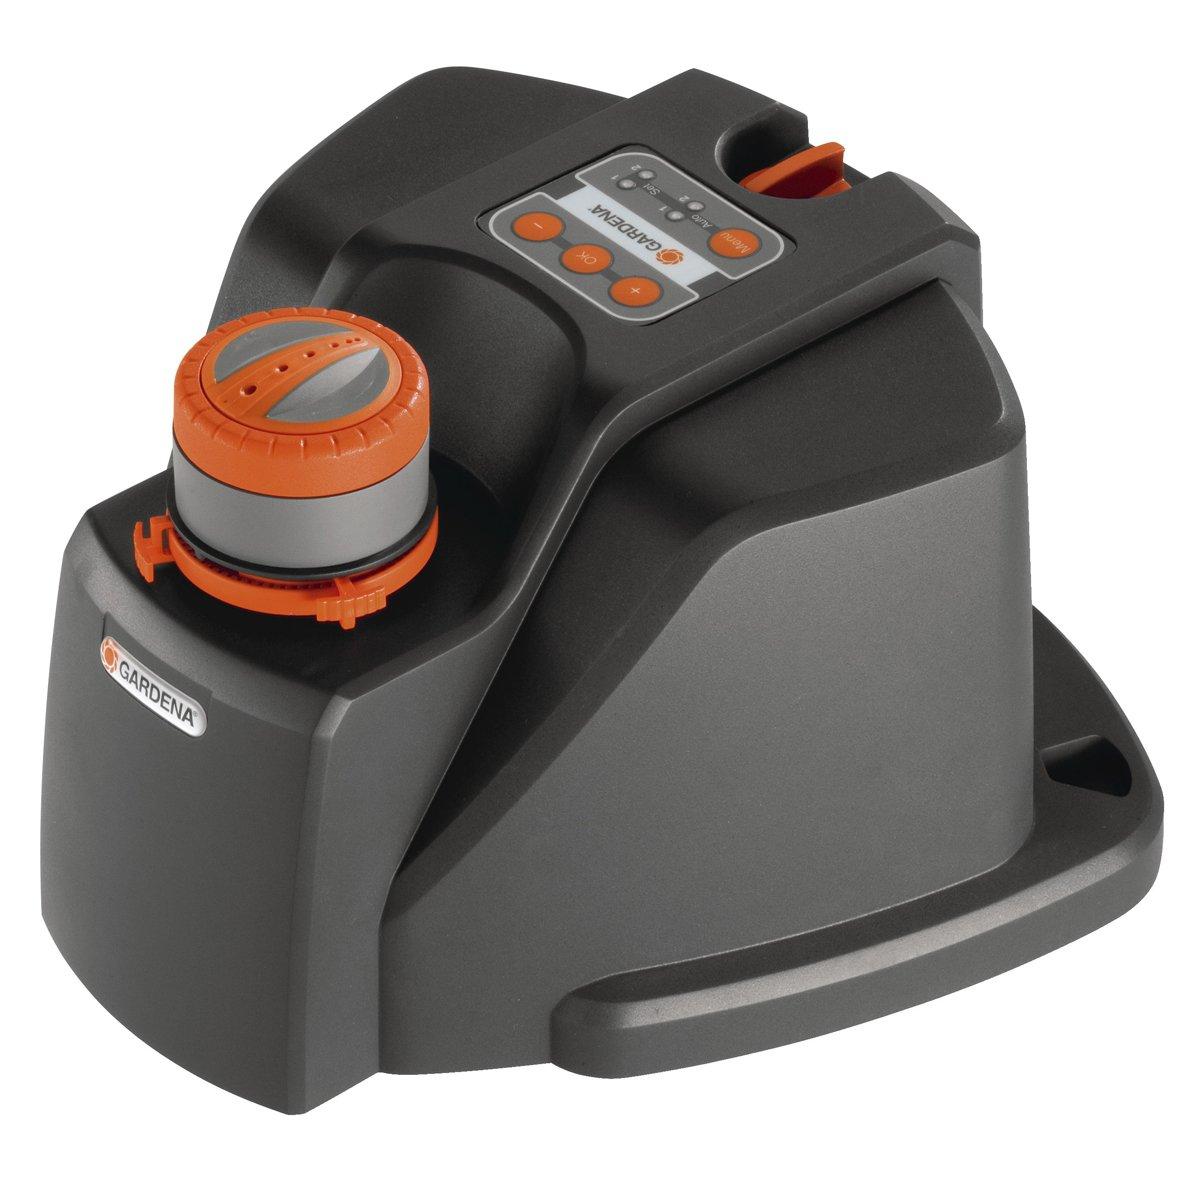 Gardena 8133-20 Comfort Vielflächenregner AquaContour automatic